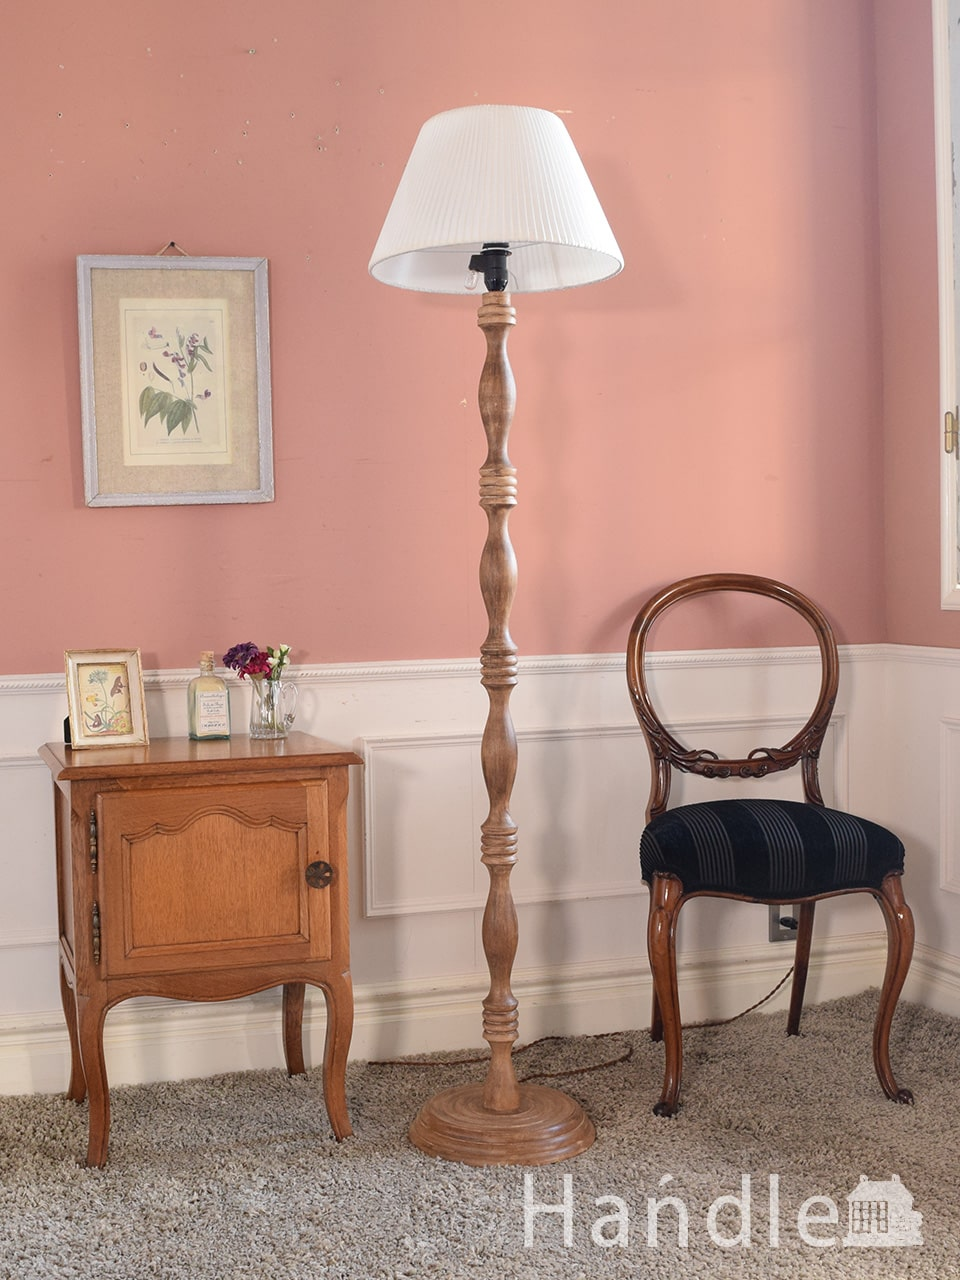 Handleのオリジナル照明、木製のフロアランプ(E26電球付き) (CR-019-c)